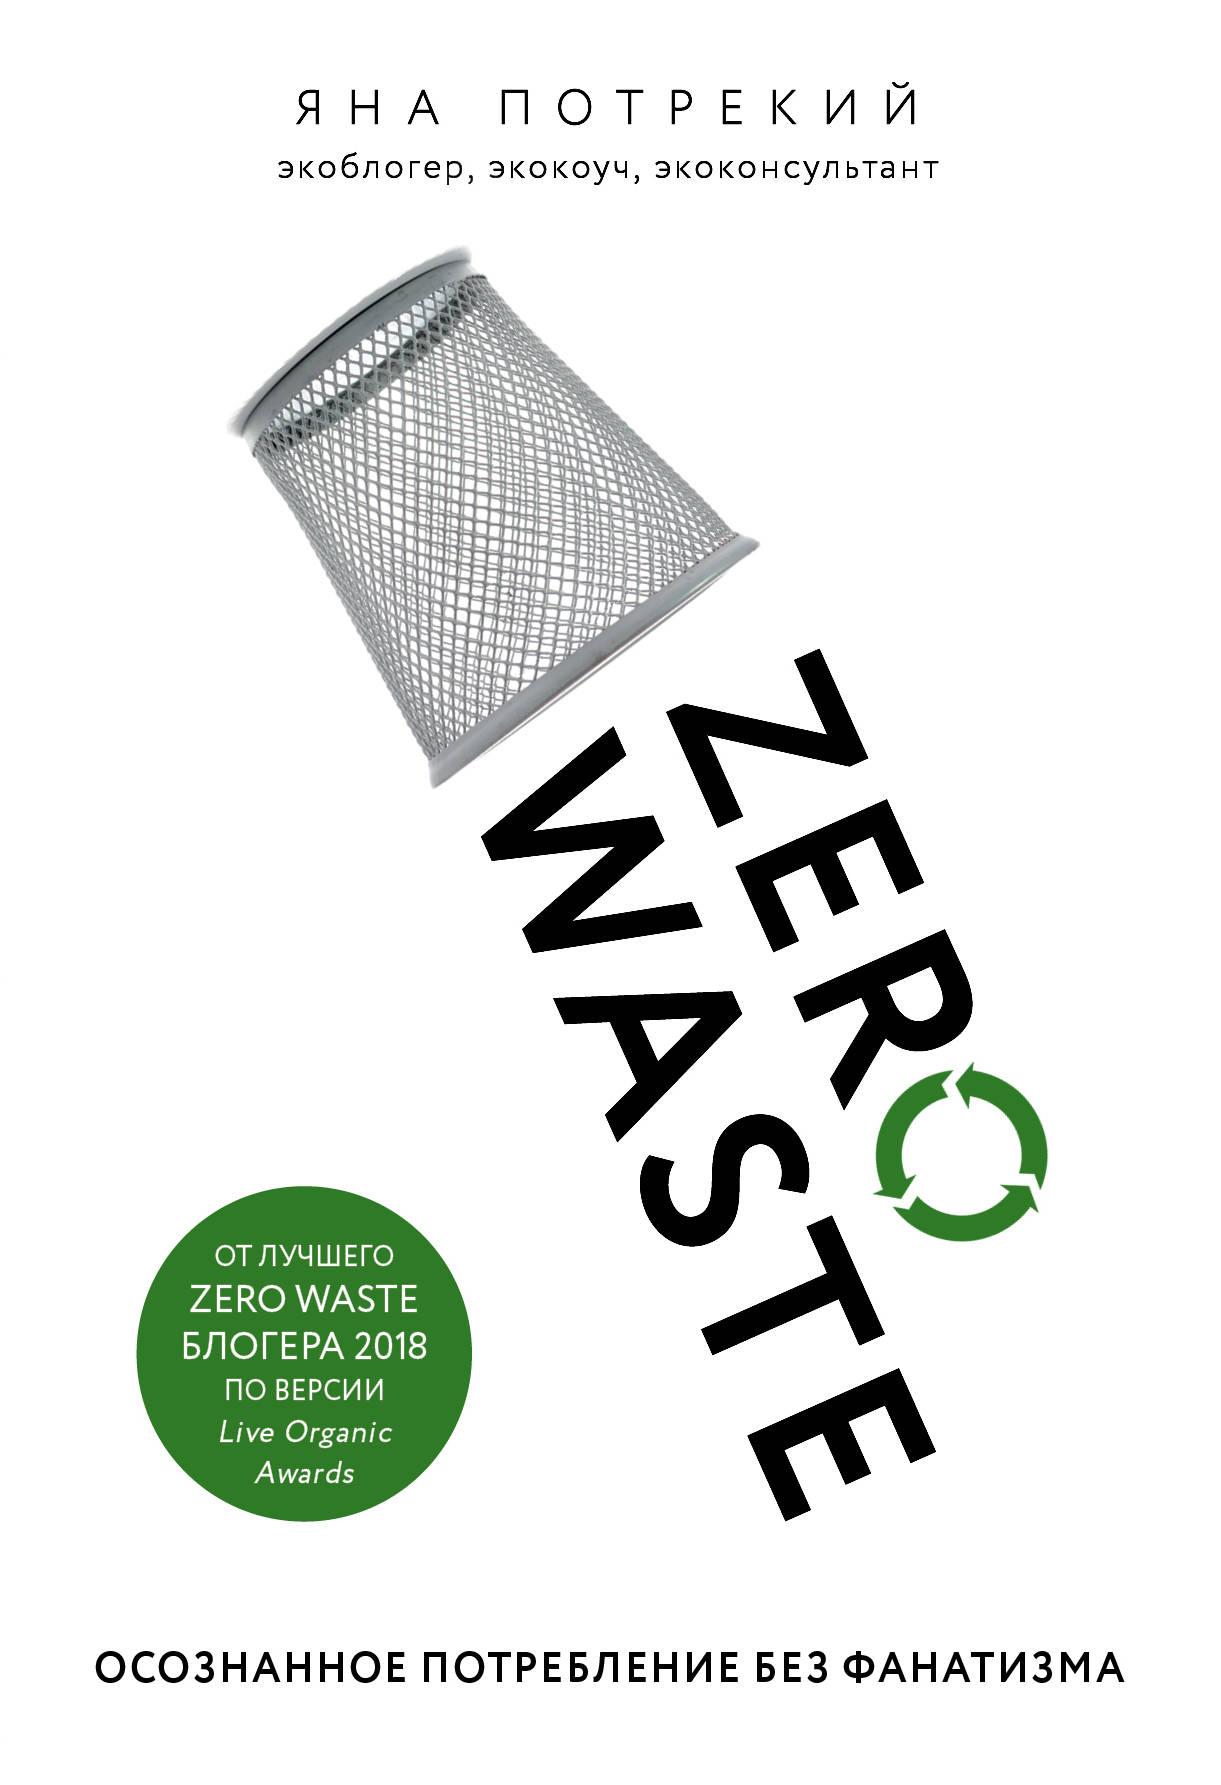 Zero Waste: Осознанное потребление без фанатизма